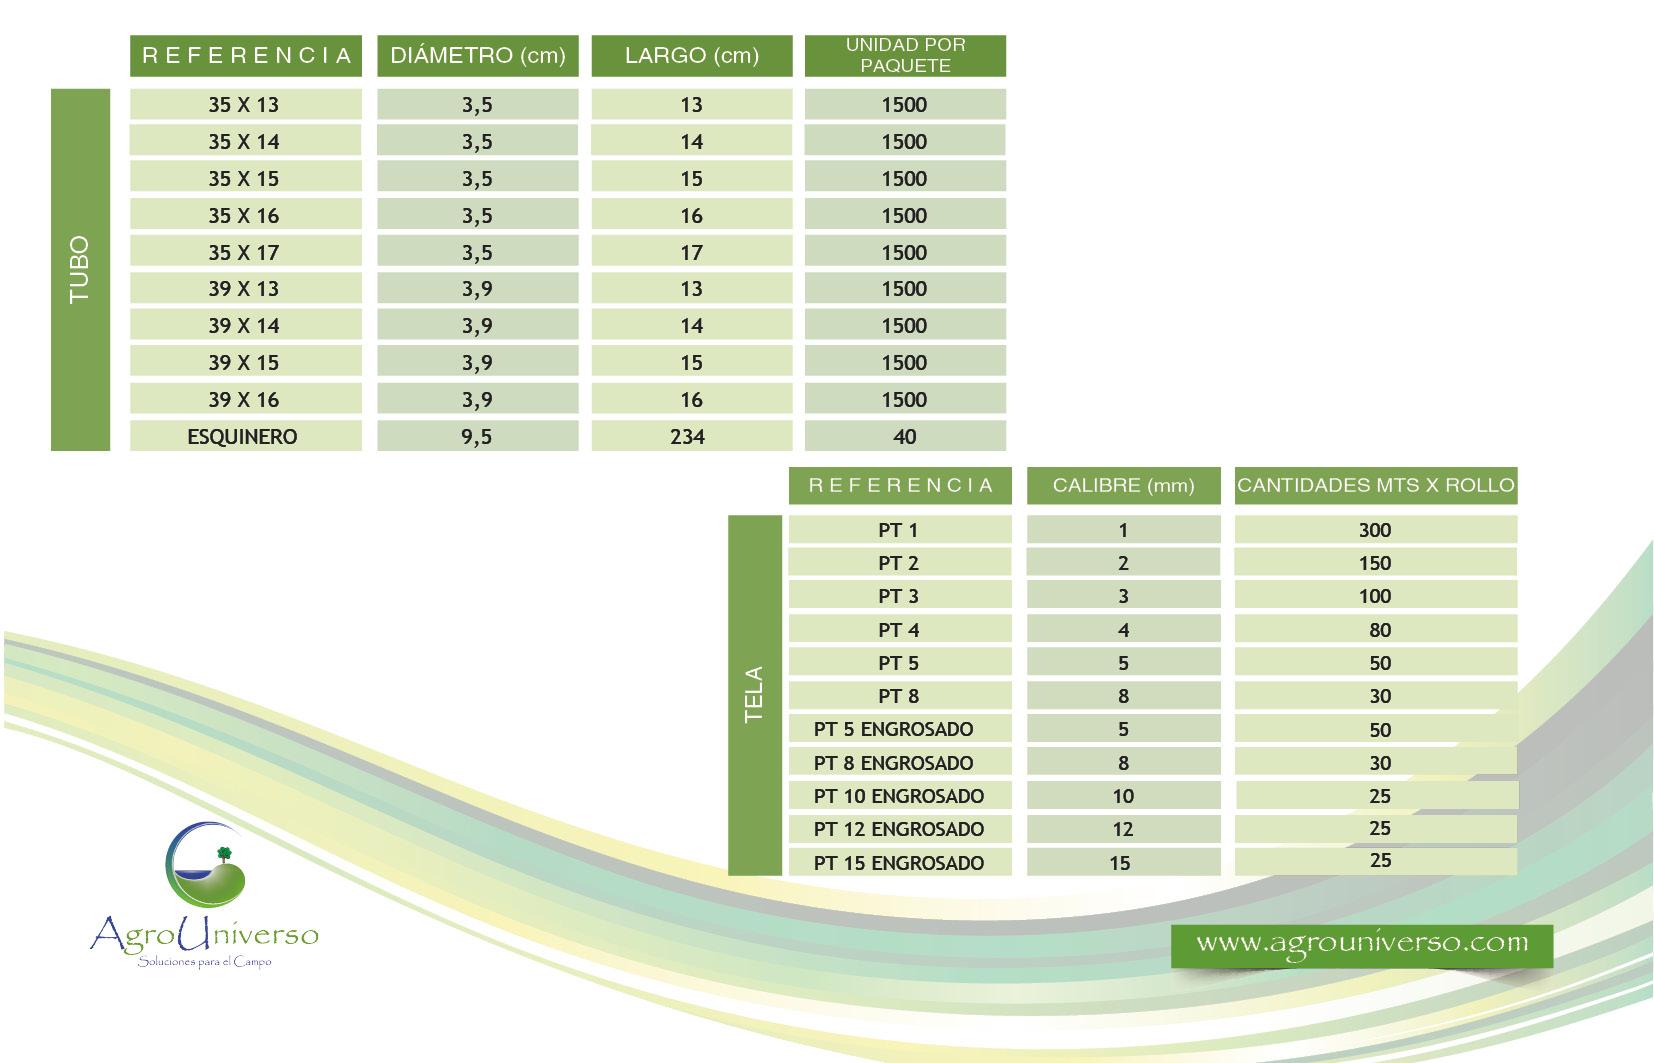 Catlogo-de-productos-Agrouniverso-37